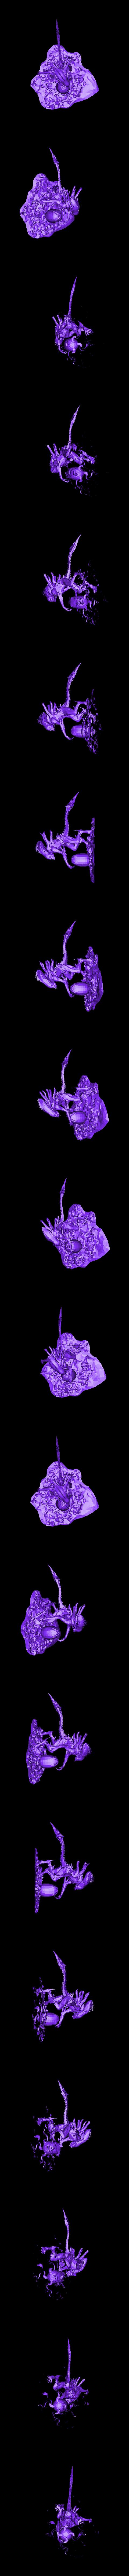 ALIEN.stl Download free STL file Alien with the Egg • 3D print design, Boris3dStudio